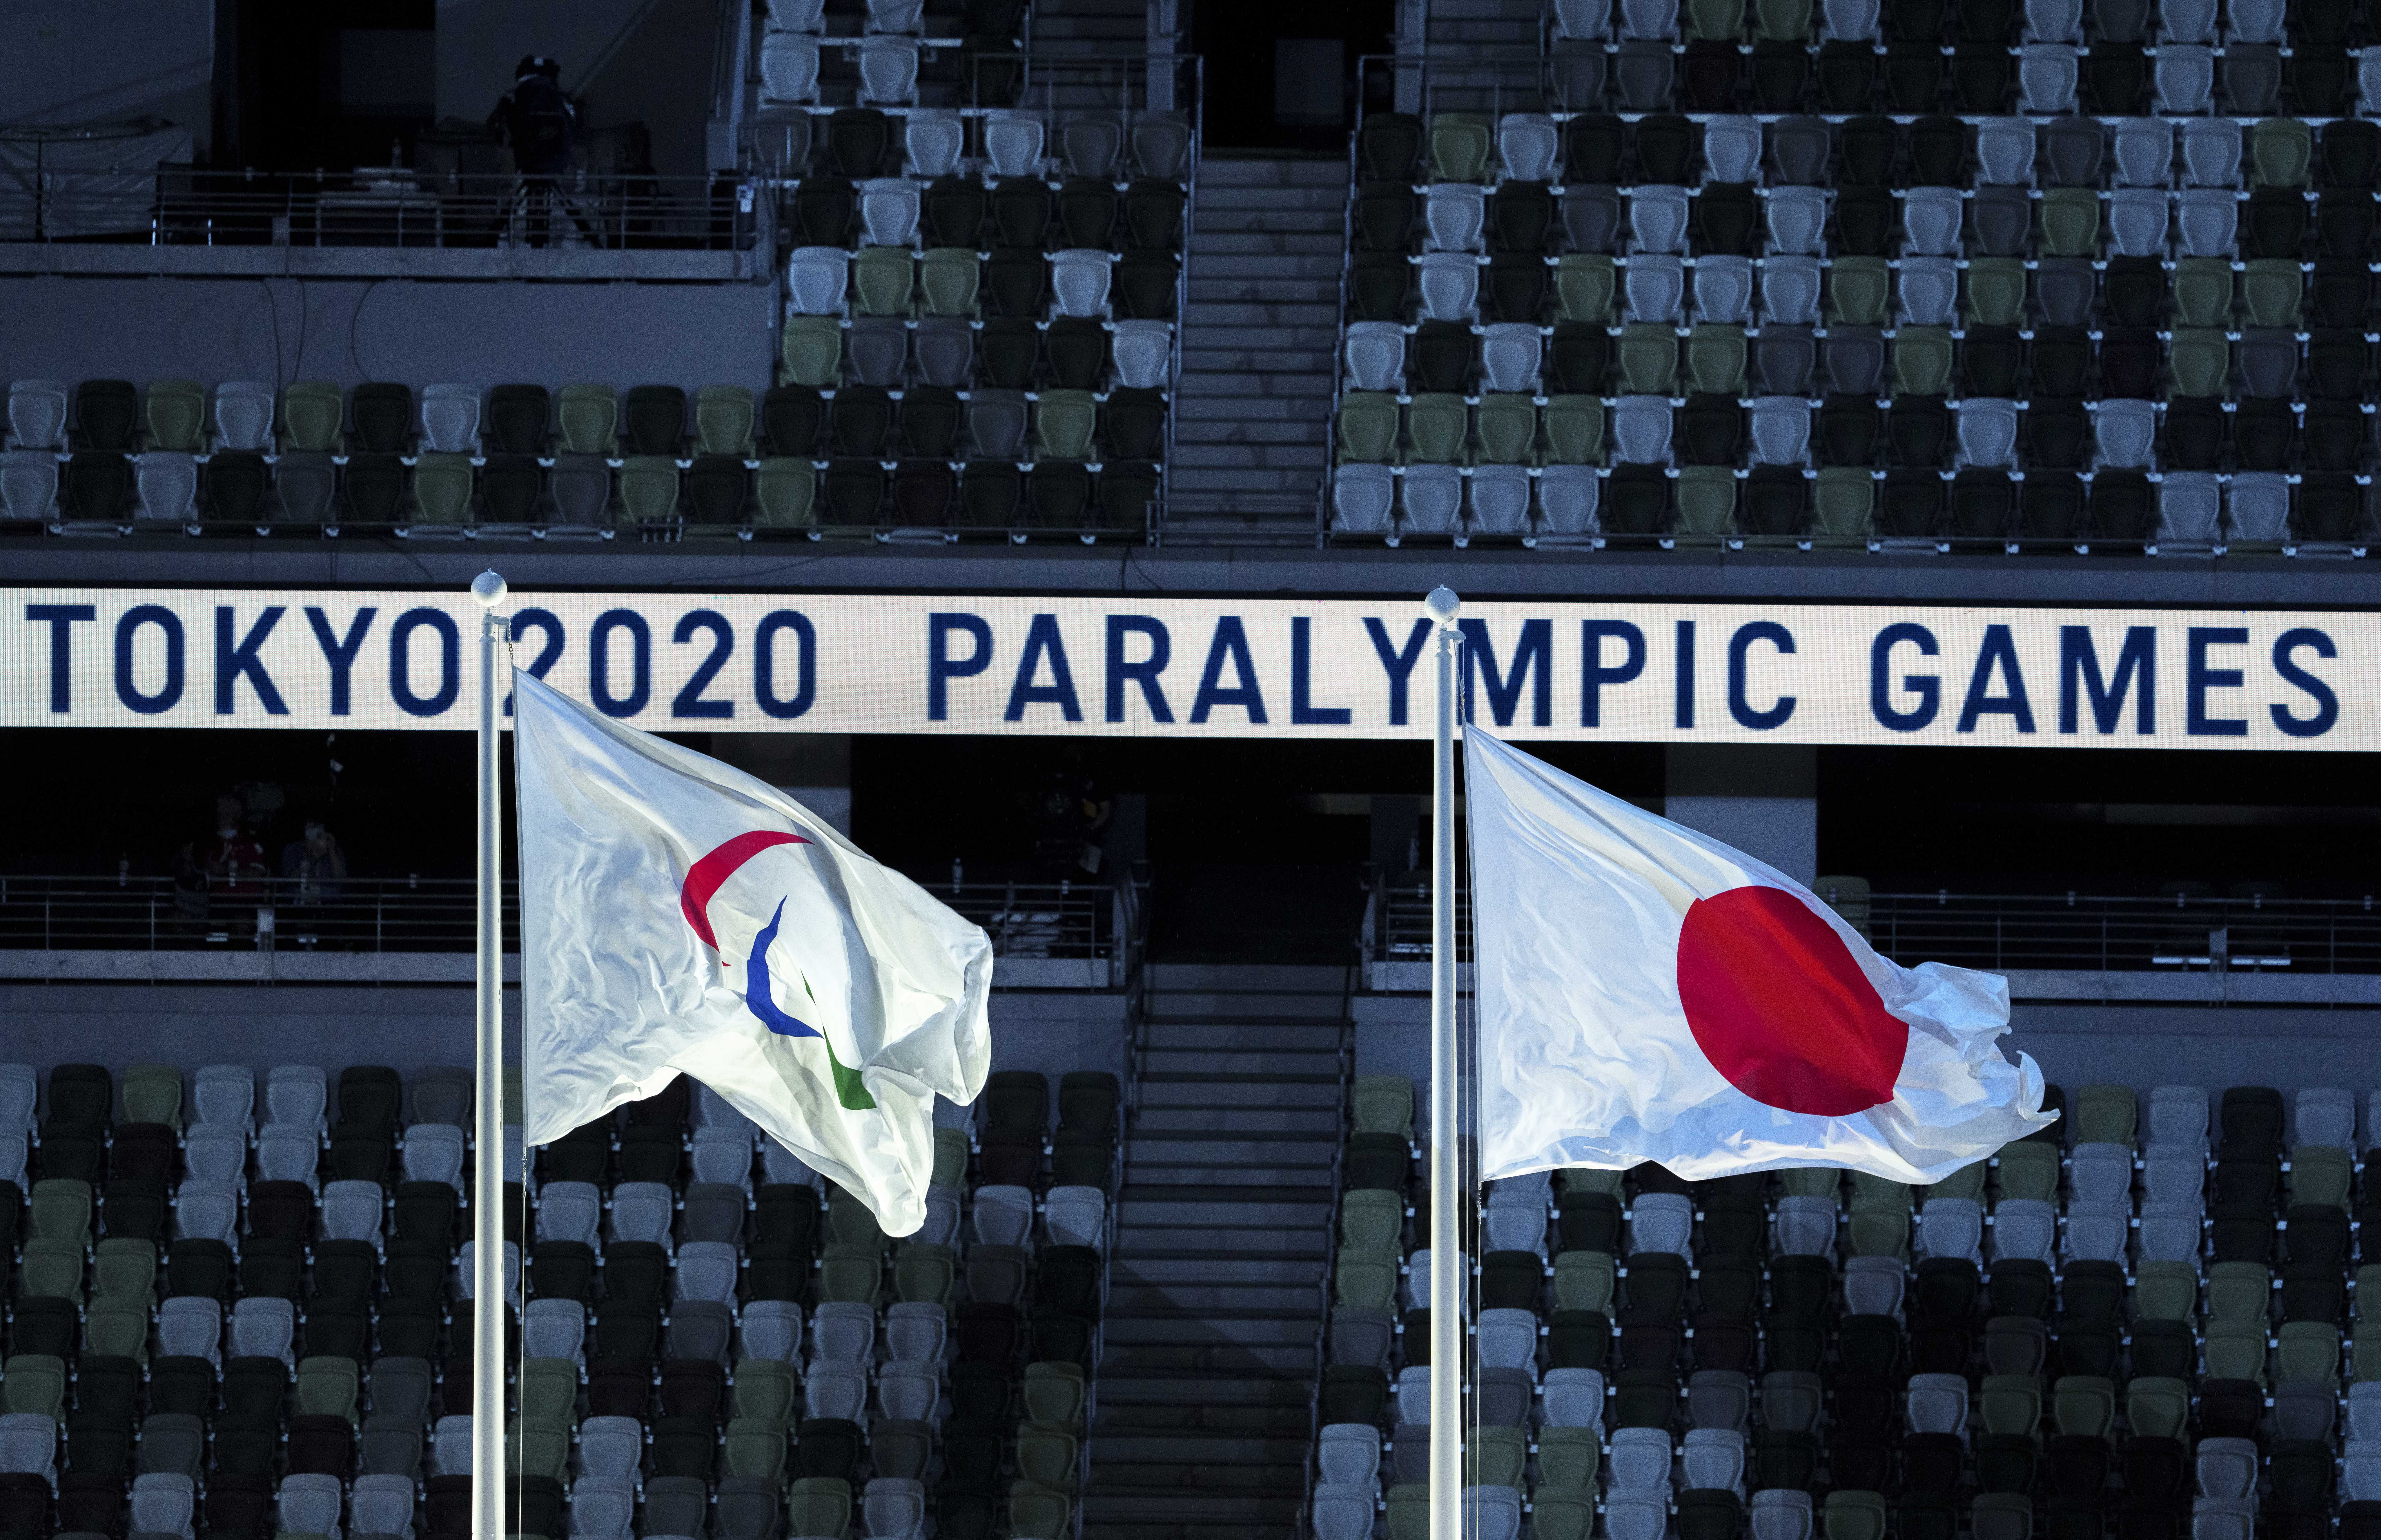 Brazil wins gold in men's soccer at 2020 Paralympics